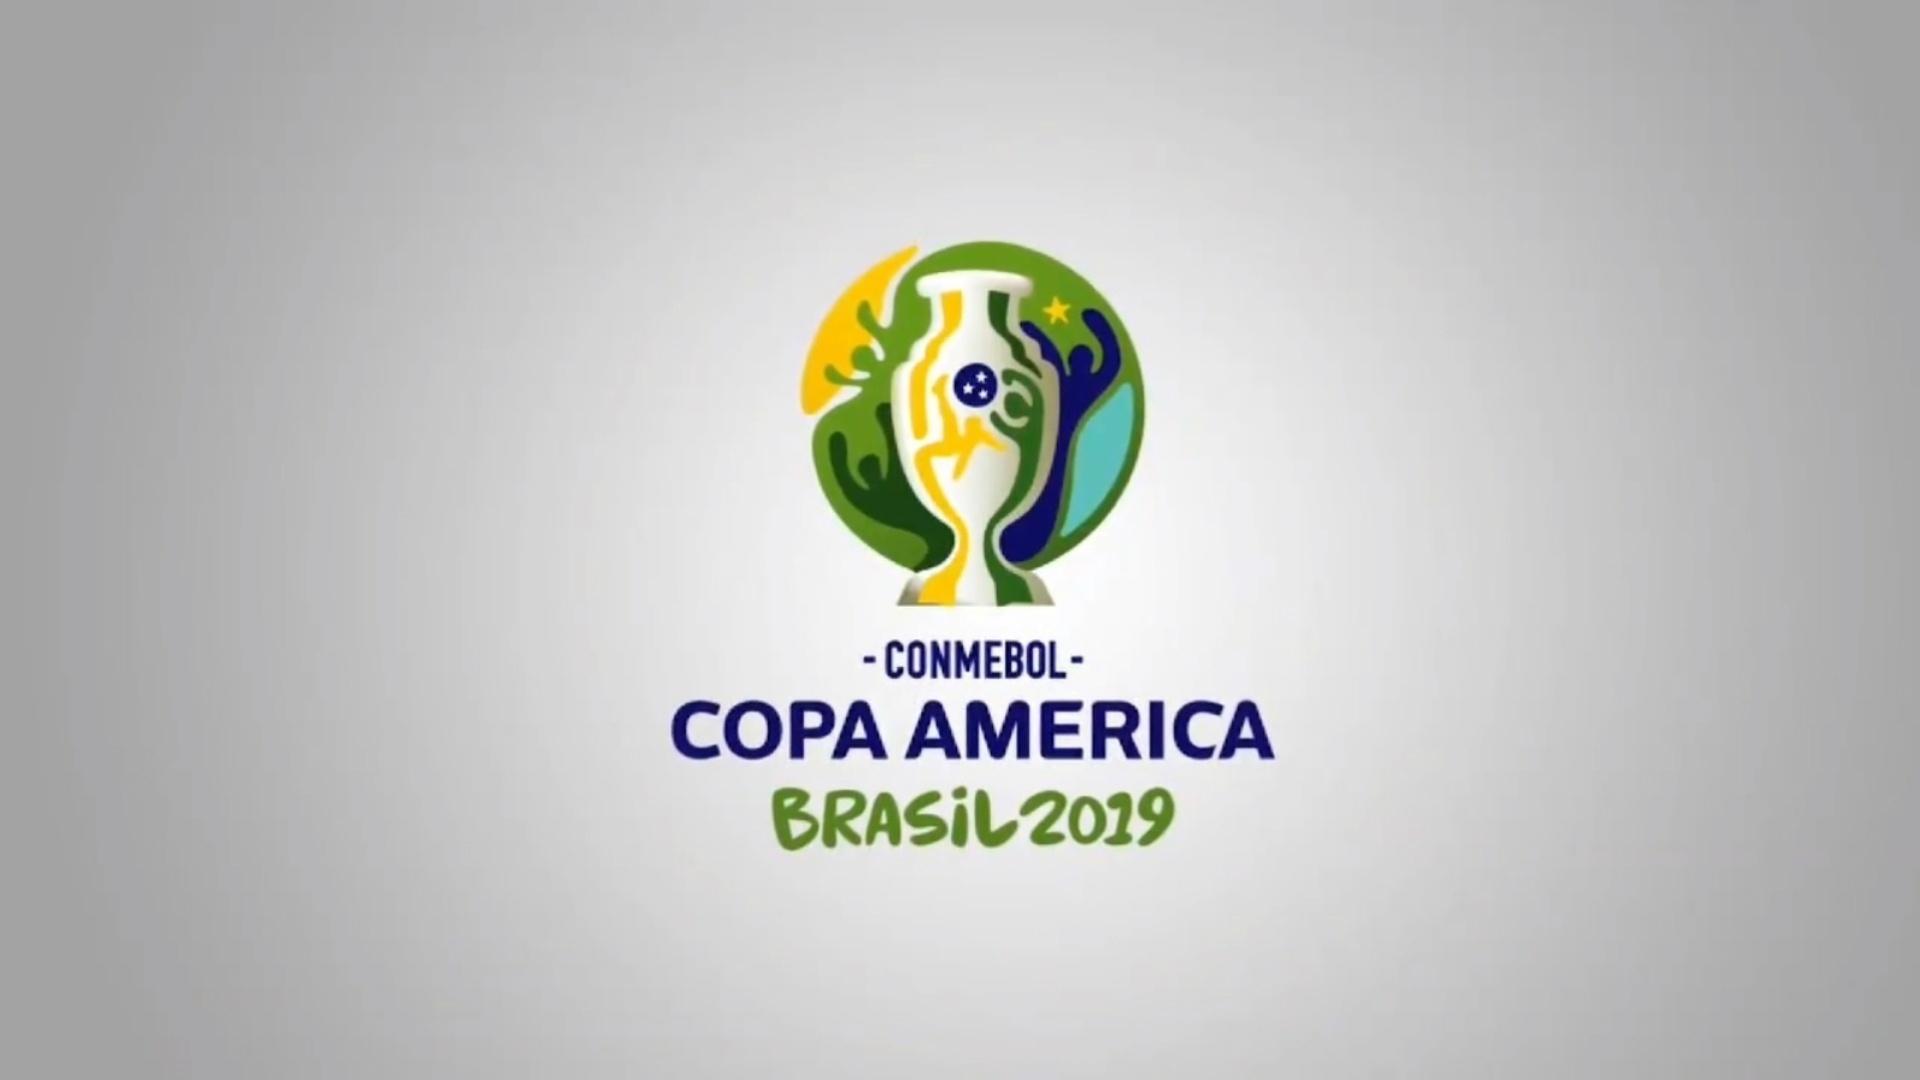 Brahma é a nova patrocinadora da Copa América 2019